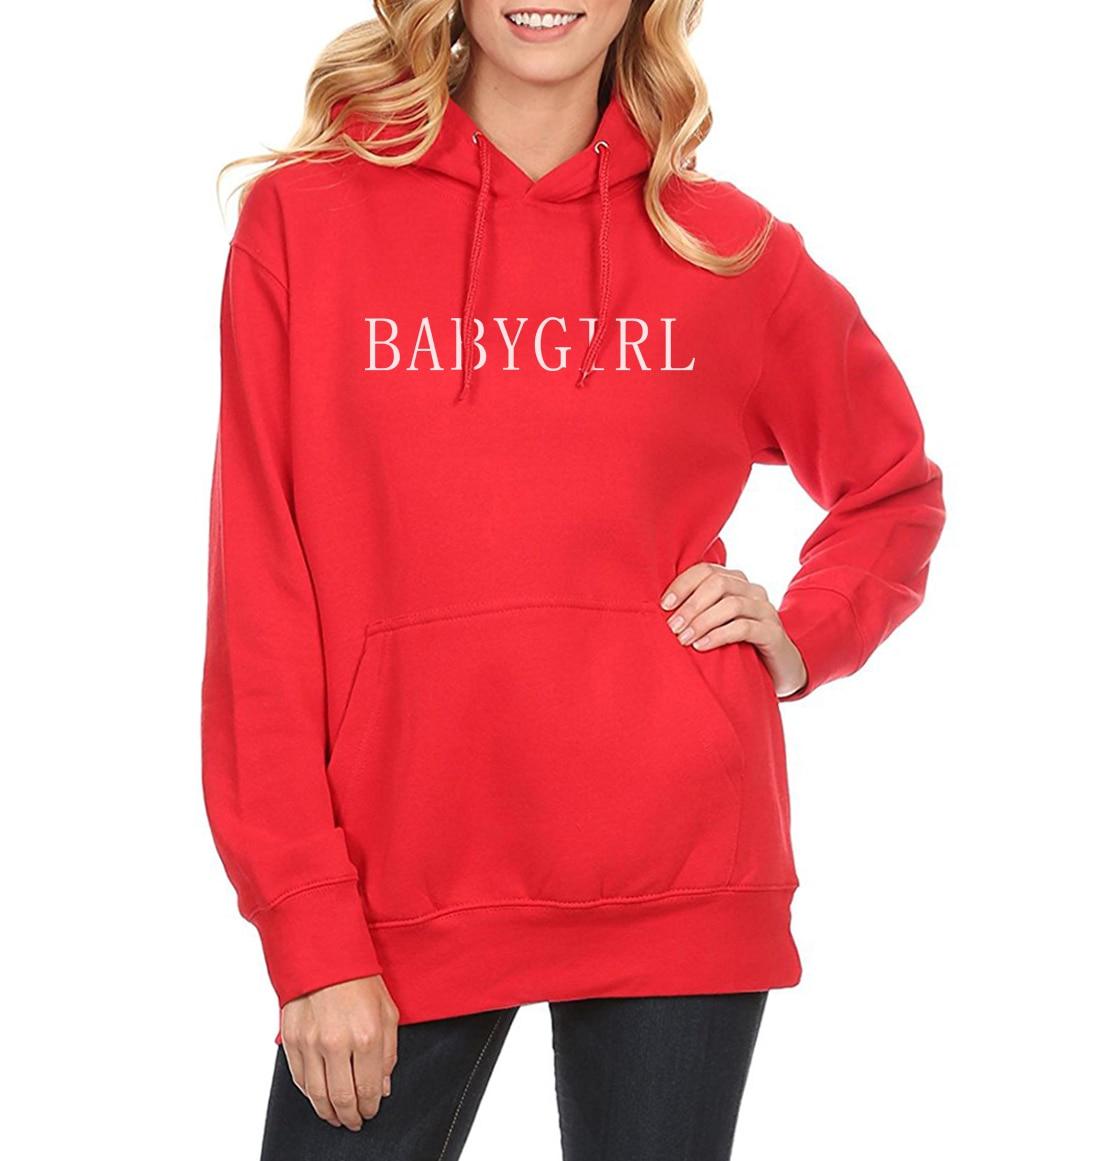 2019 New Fashion Autumn Winter Fleece Sweatshirt Letter Print Funny Hoody For Women Sportsuit Harajuku Fitness Hoodie Pullovers